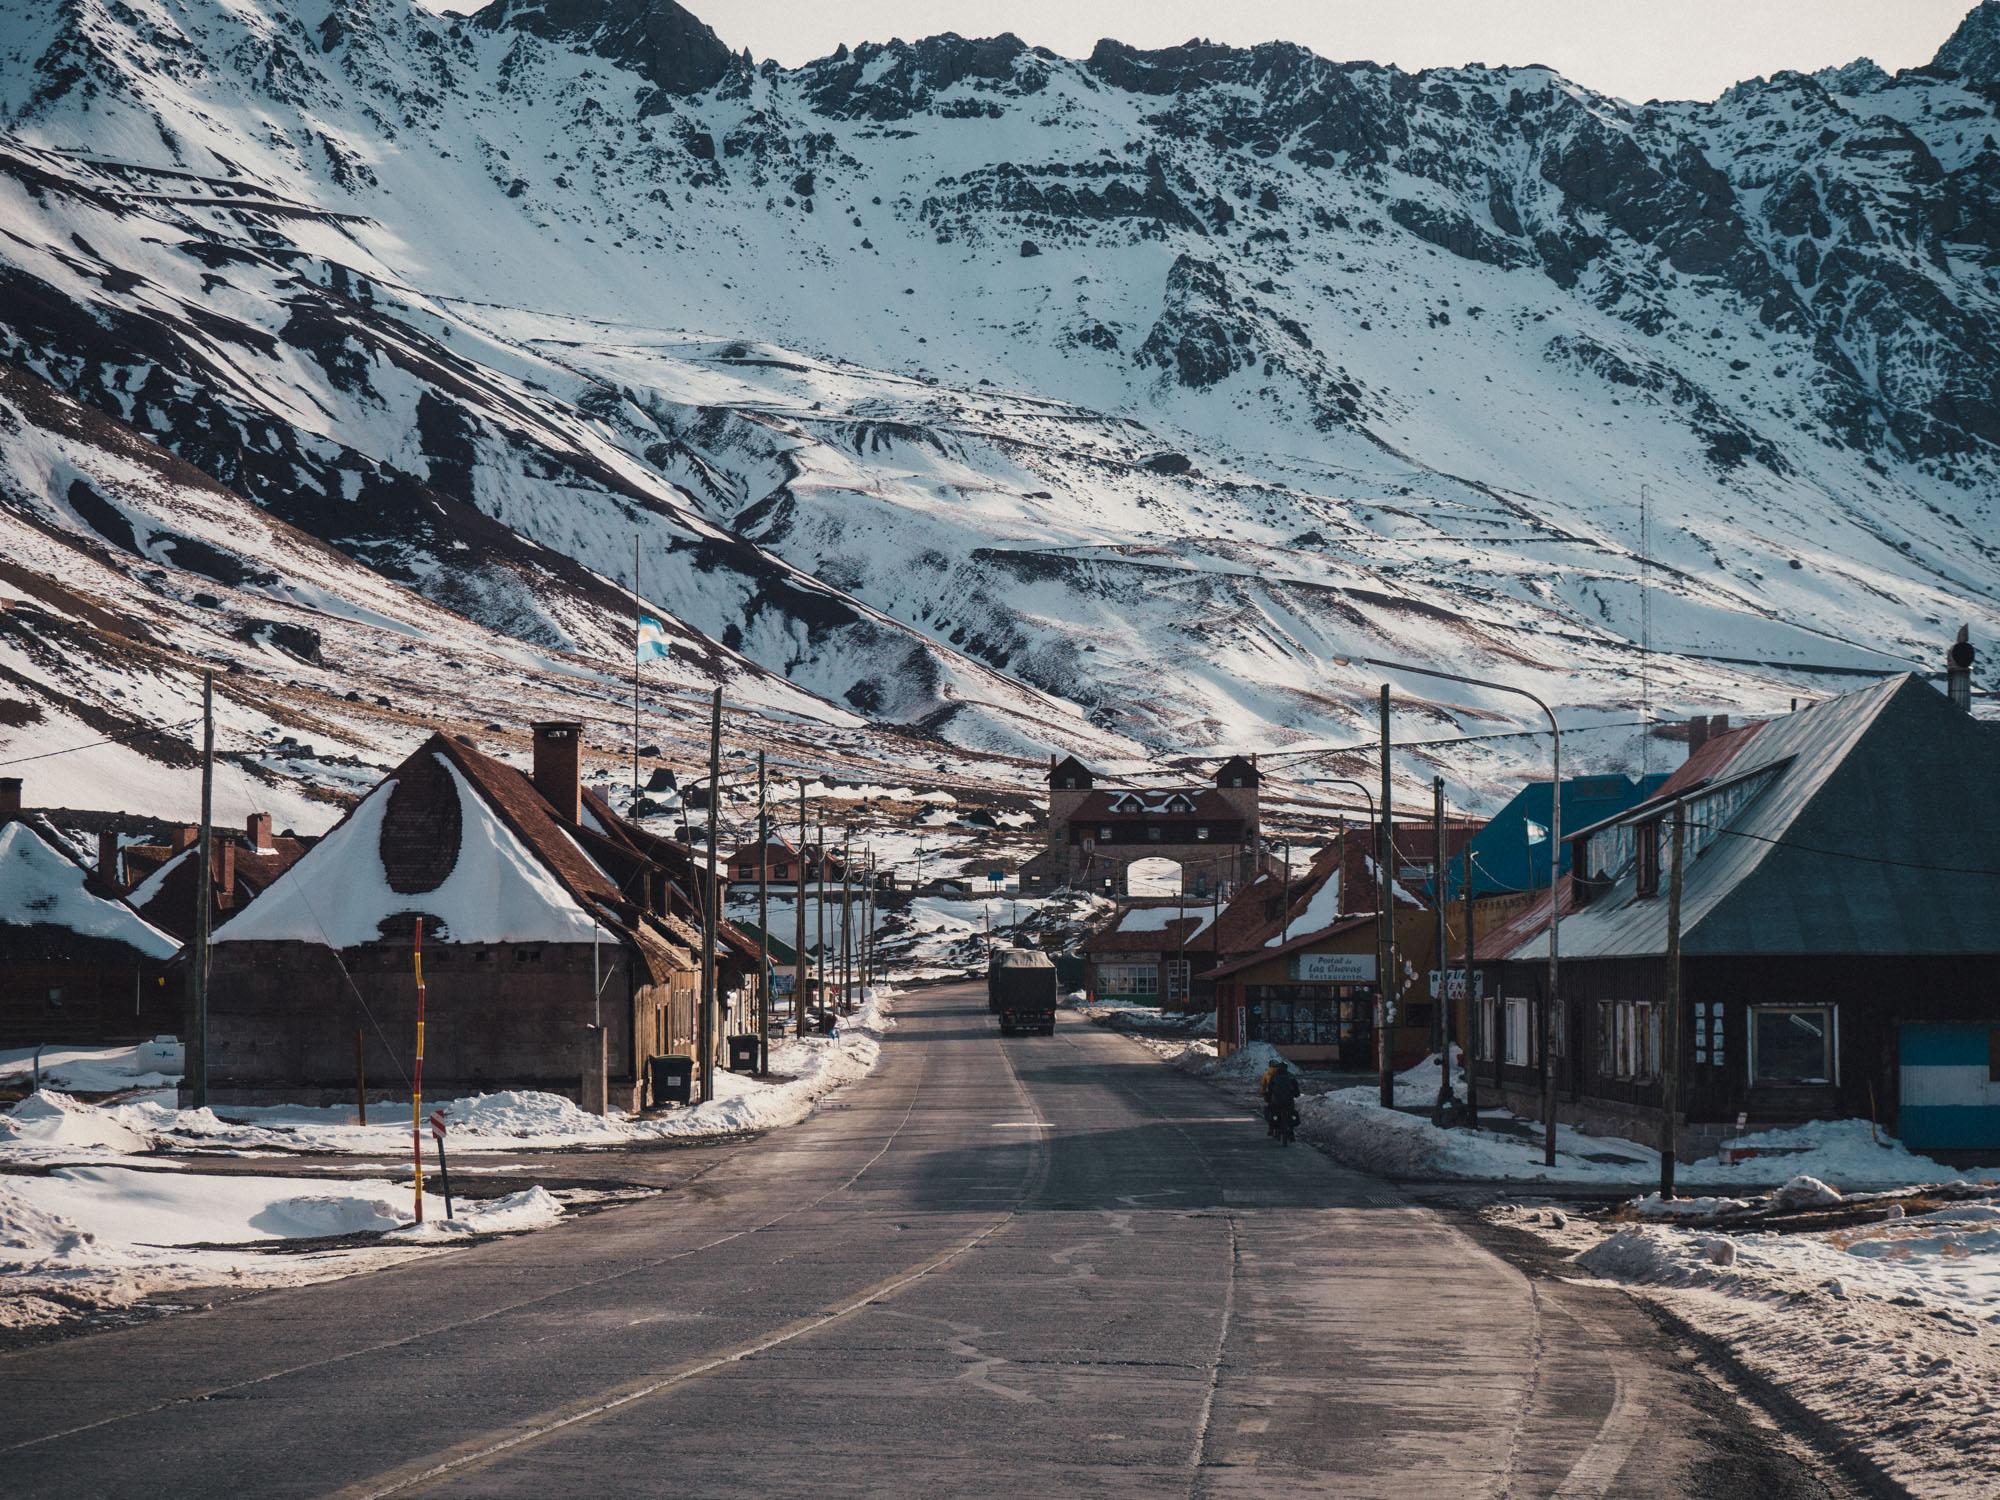 La Cueva, border town in Argentina.